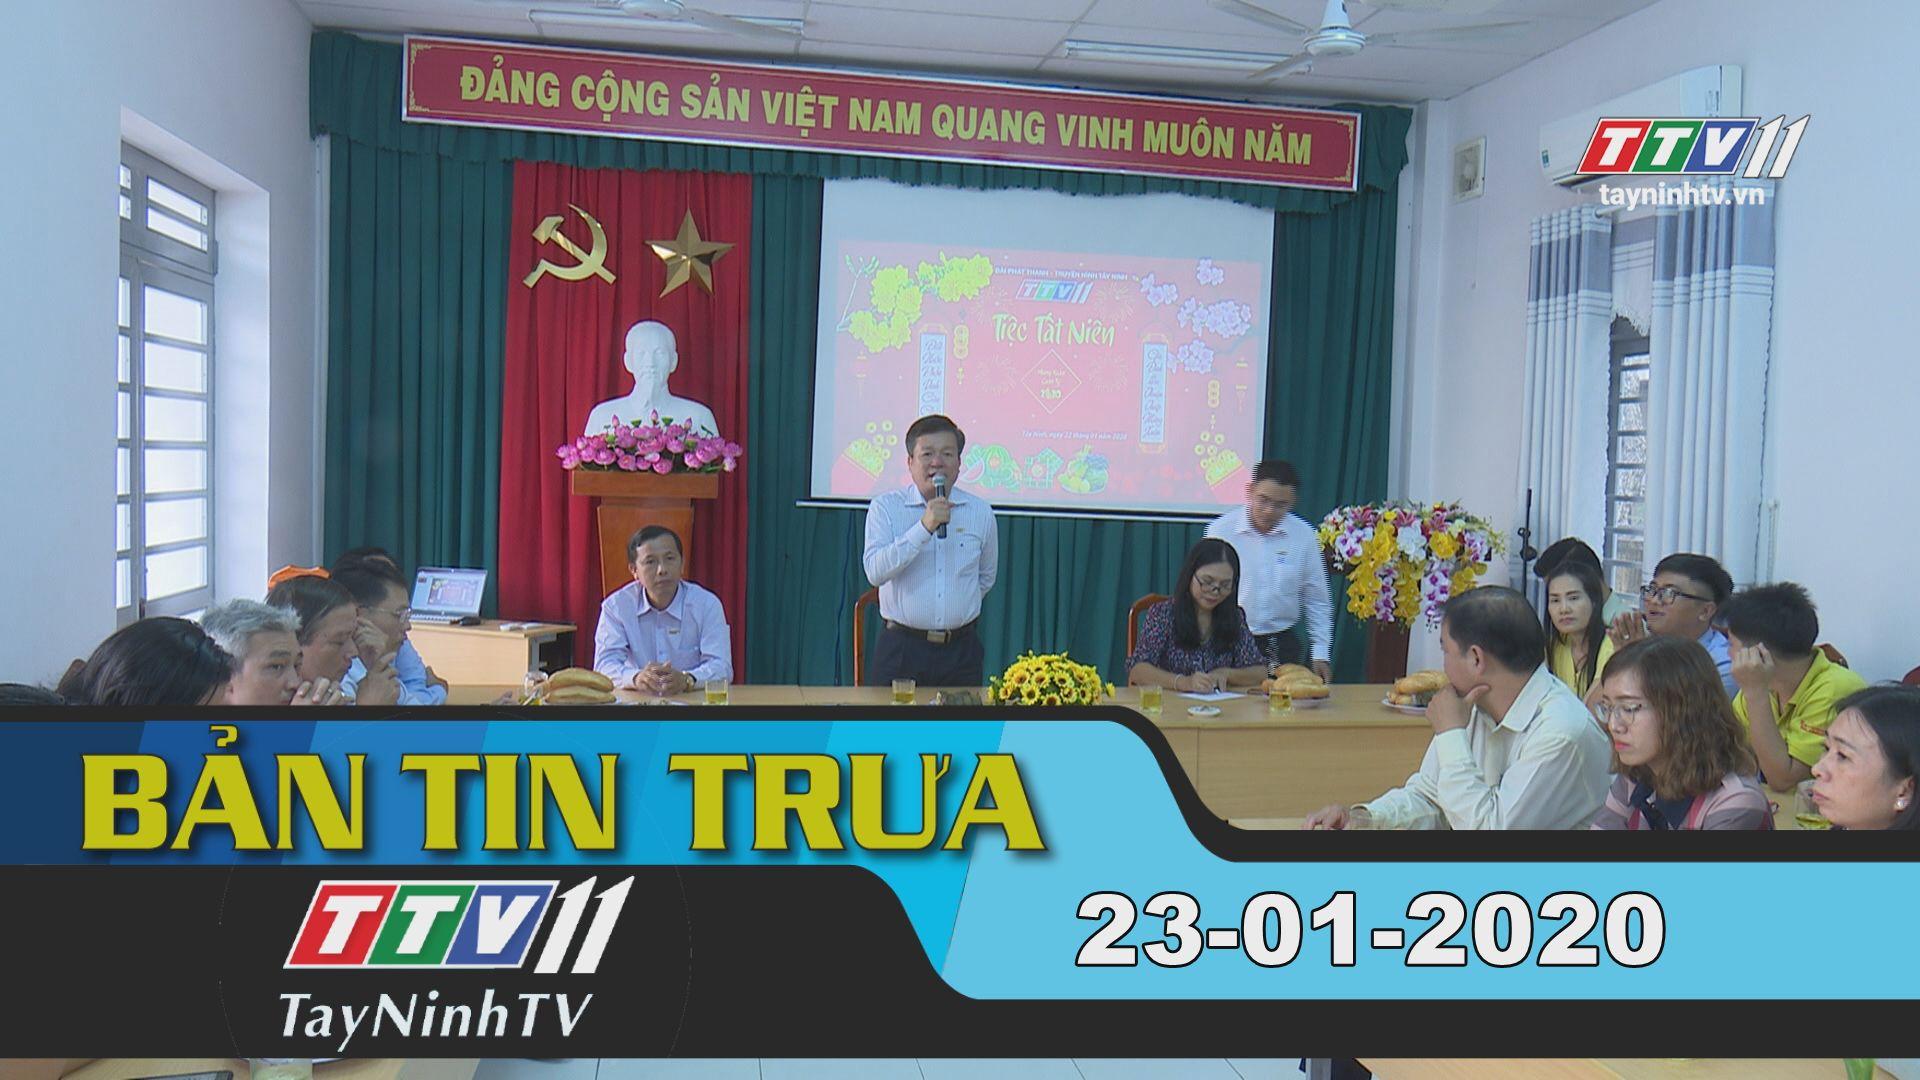 Bản tin trưa 23-01-2020 | Tin tức hôm nay | TayNinhTV